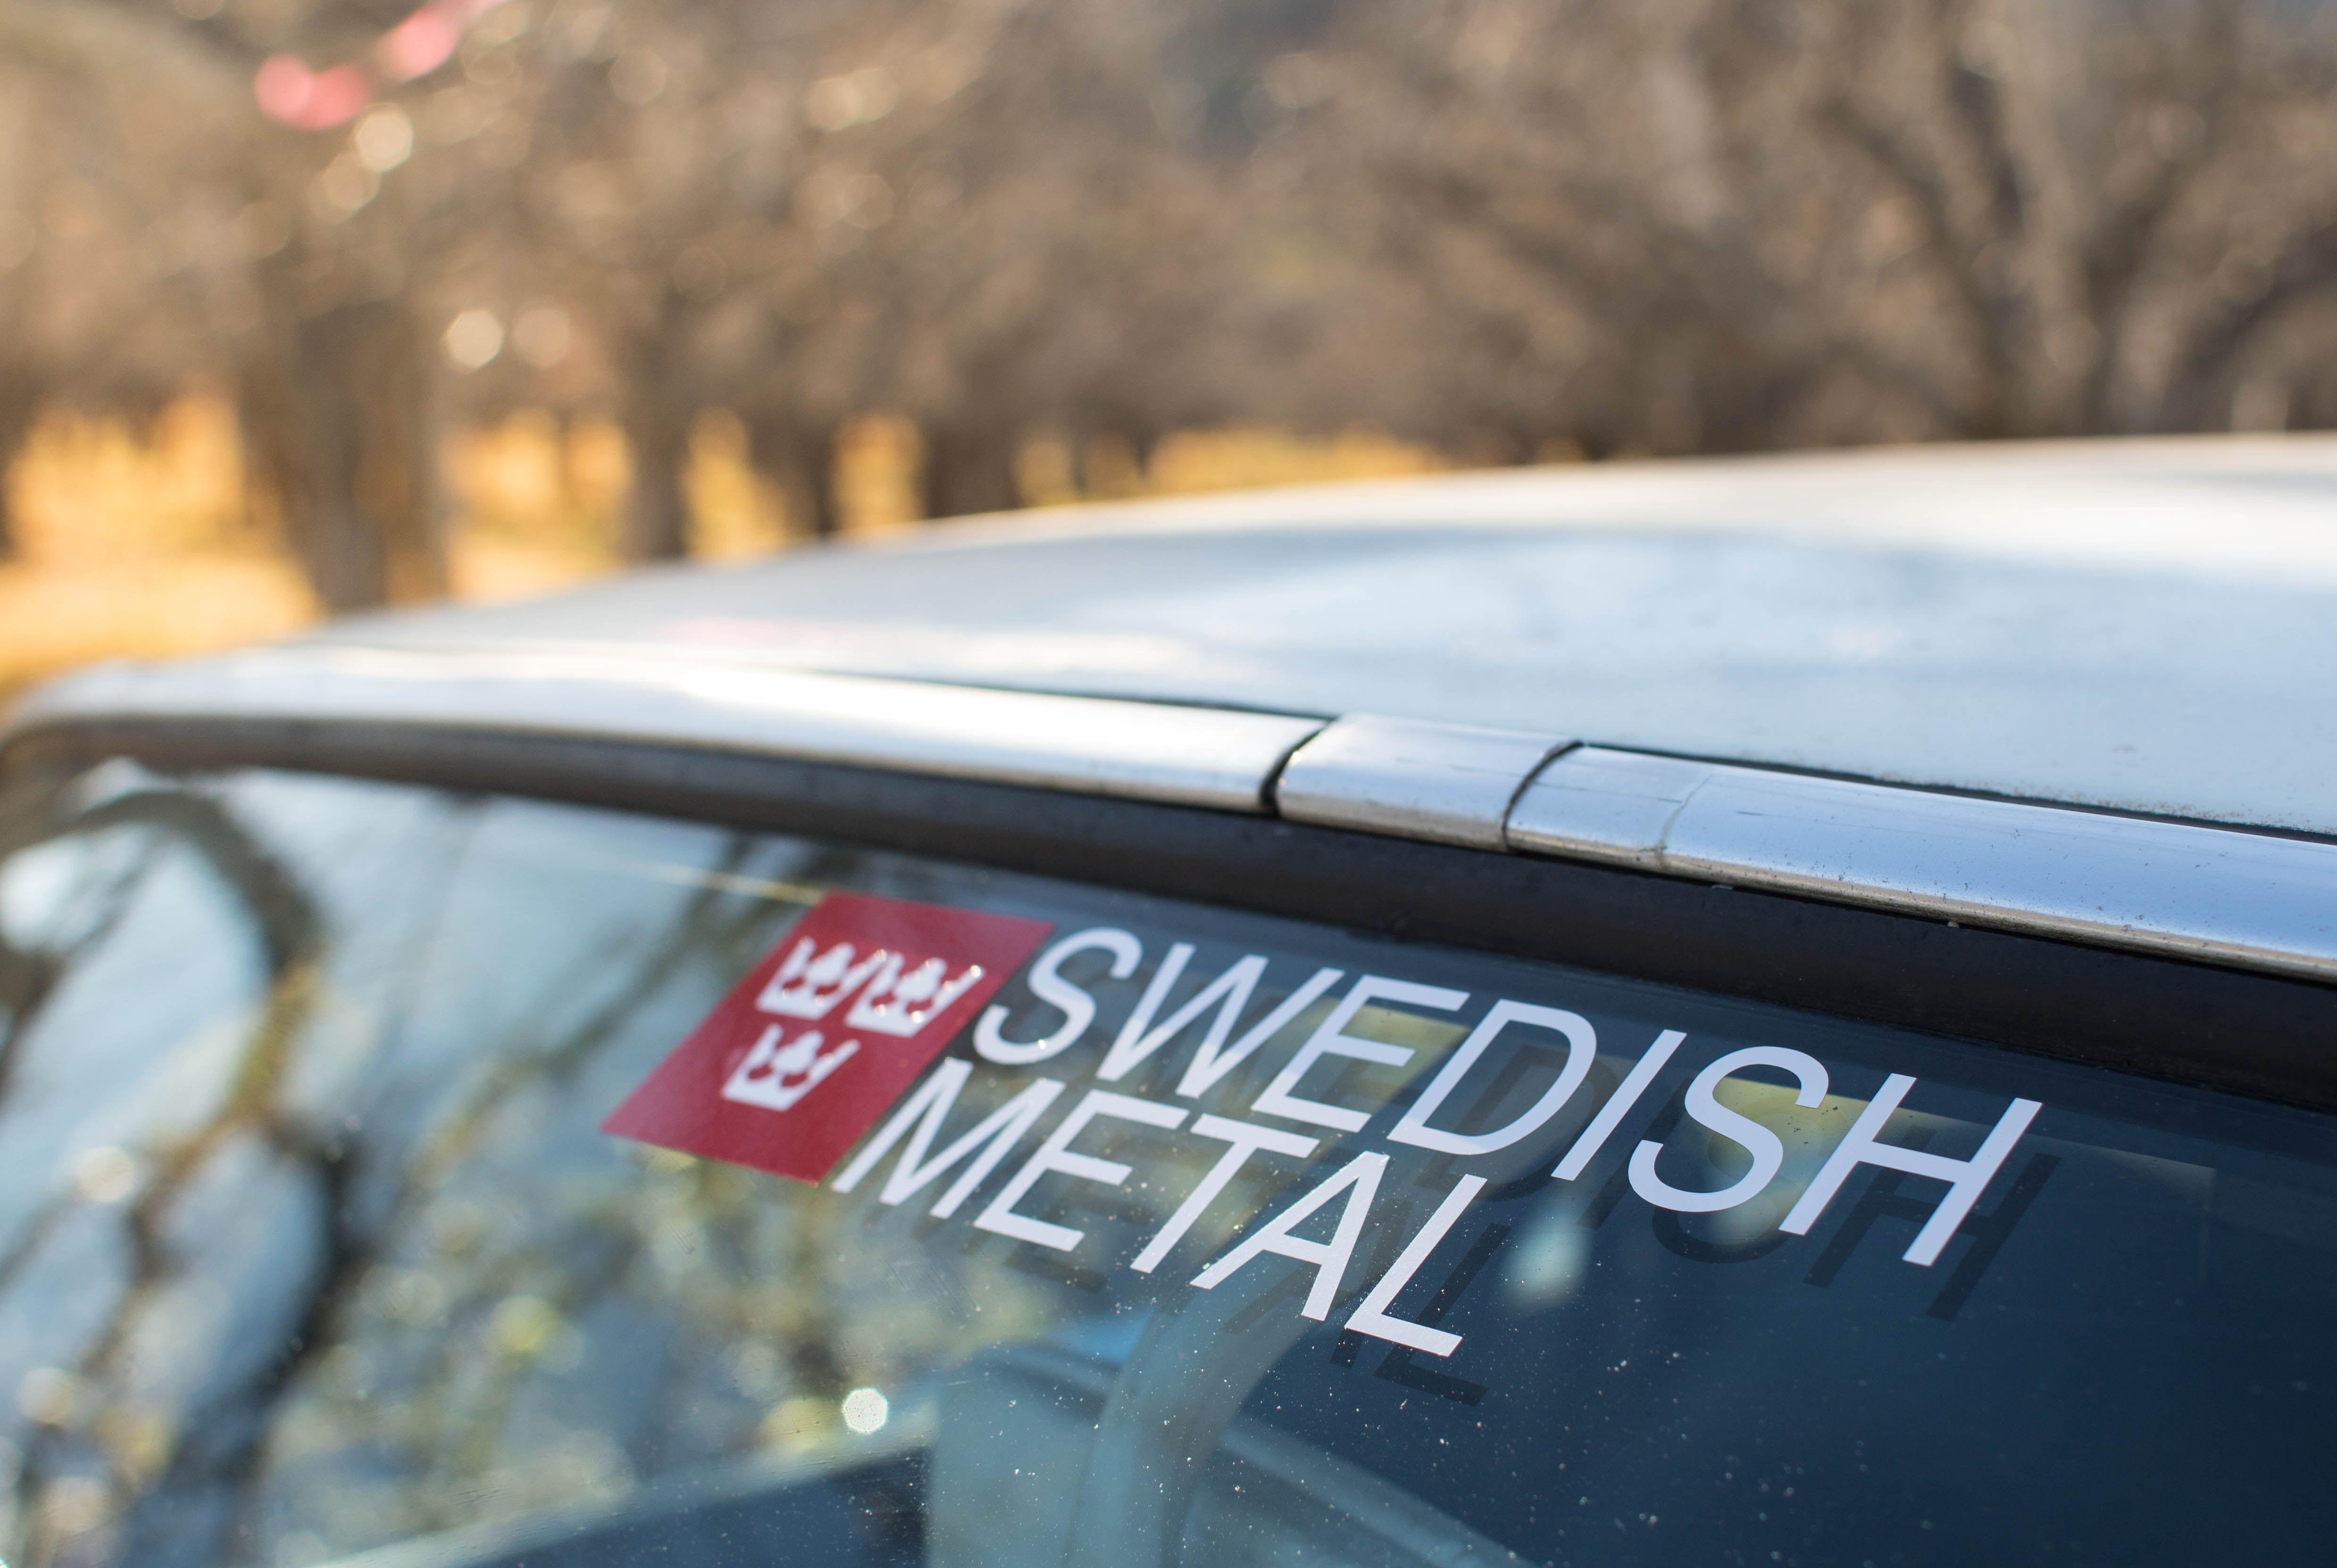 Swedishmetal Trekronor Sticker From Swedish Metal Metal Swedish Stickers [ jpg ]